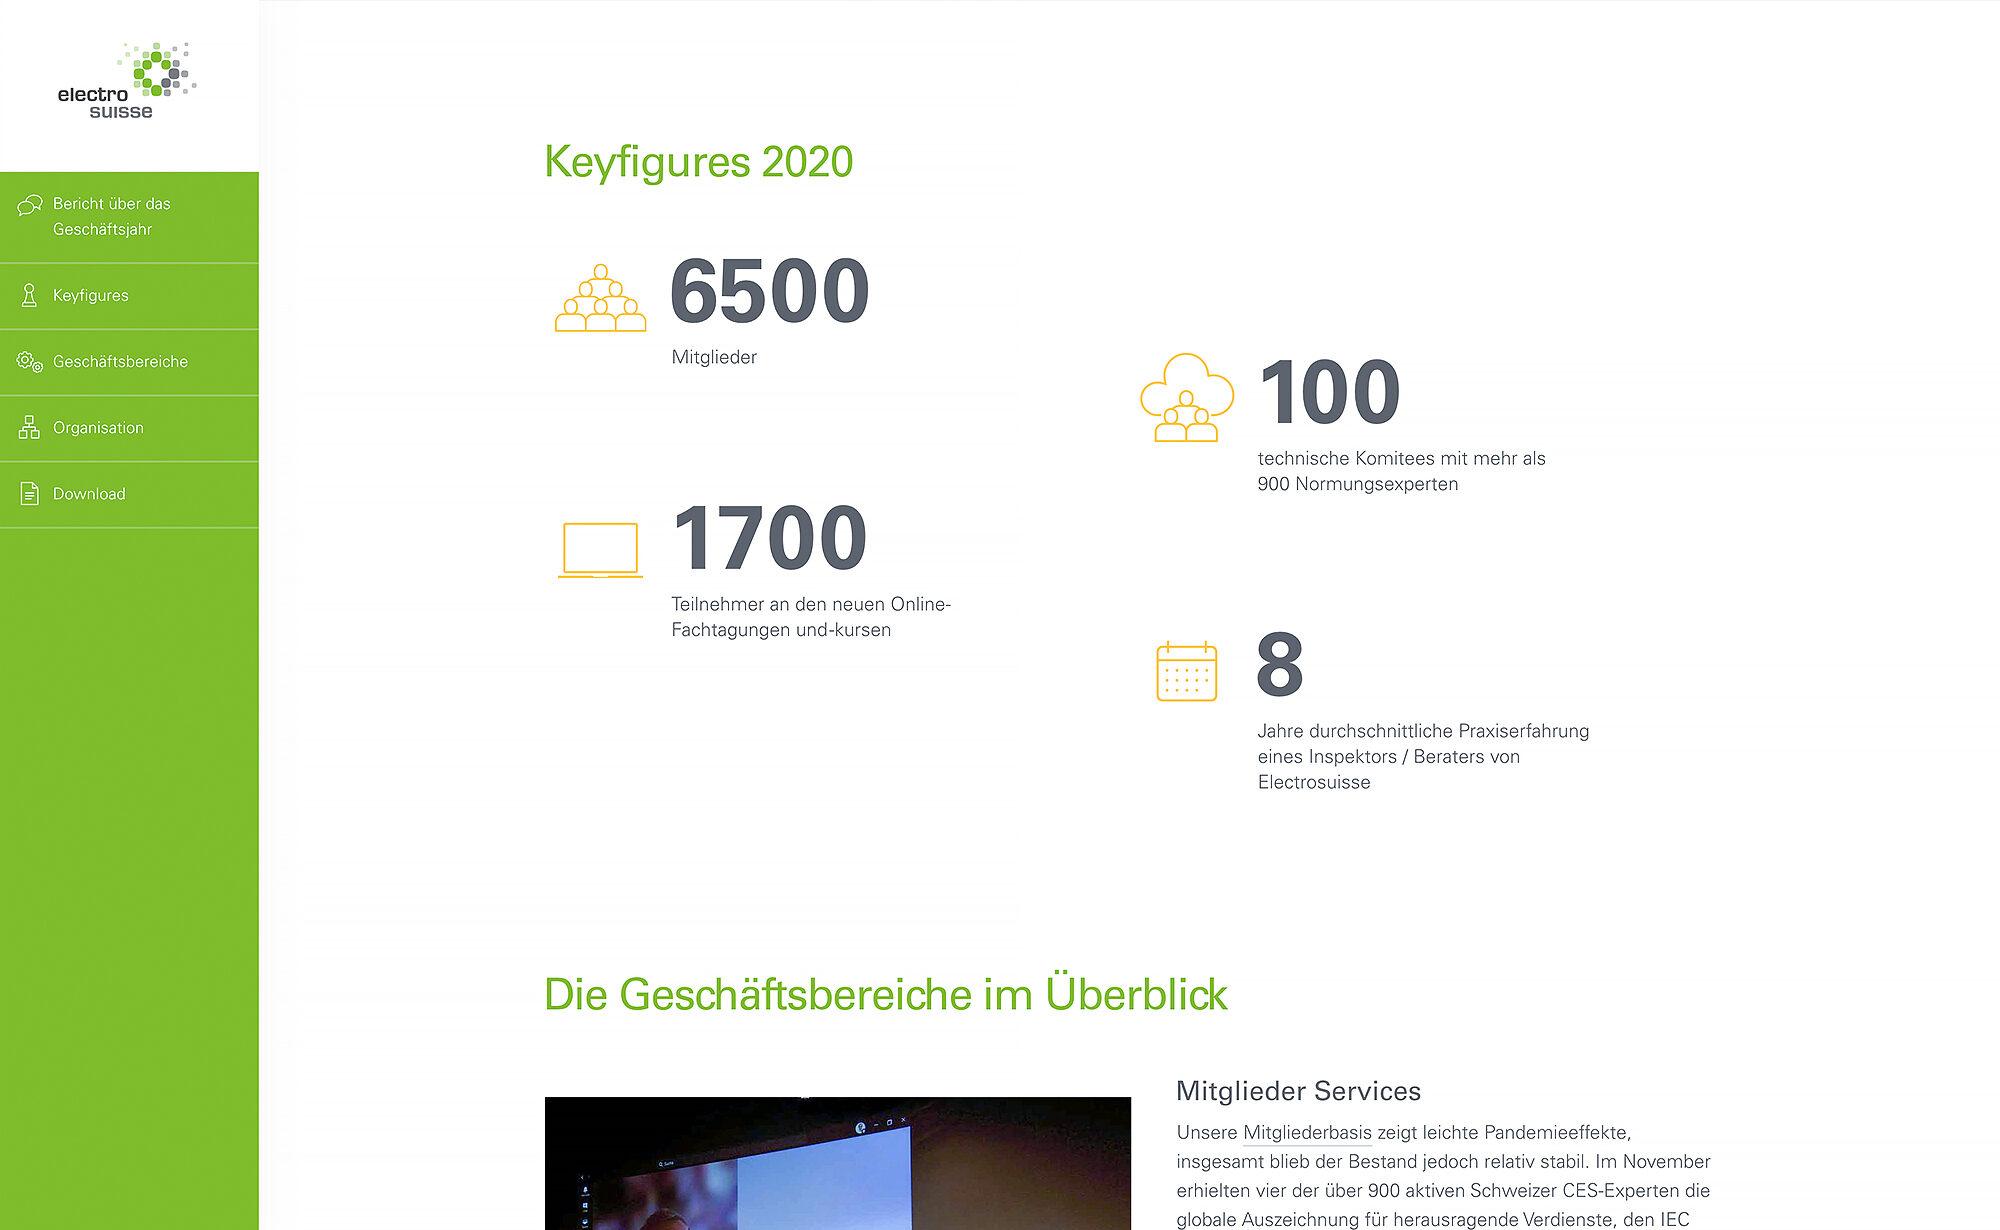 Keyfigures - Website Screenshot, Electrosuisse Digitaler Geschäftsbericht